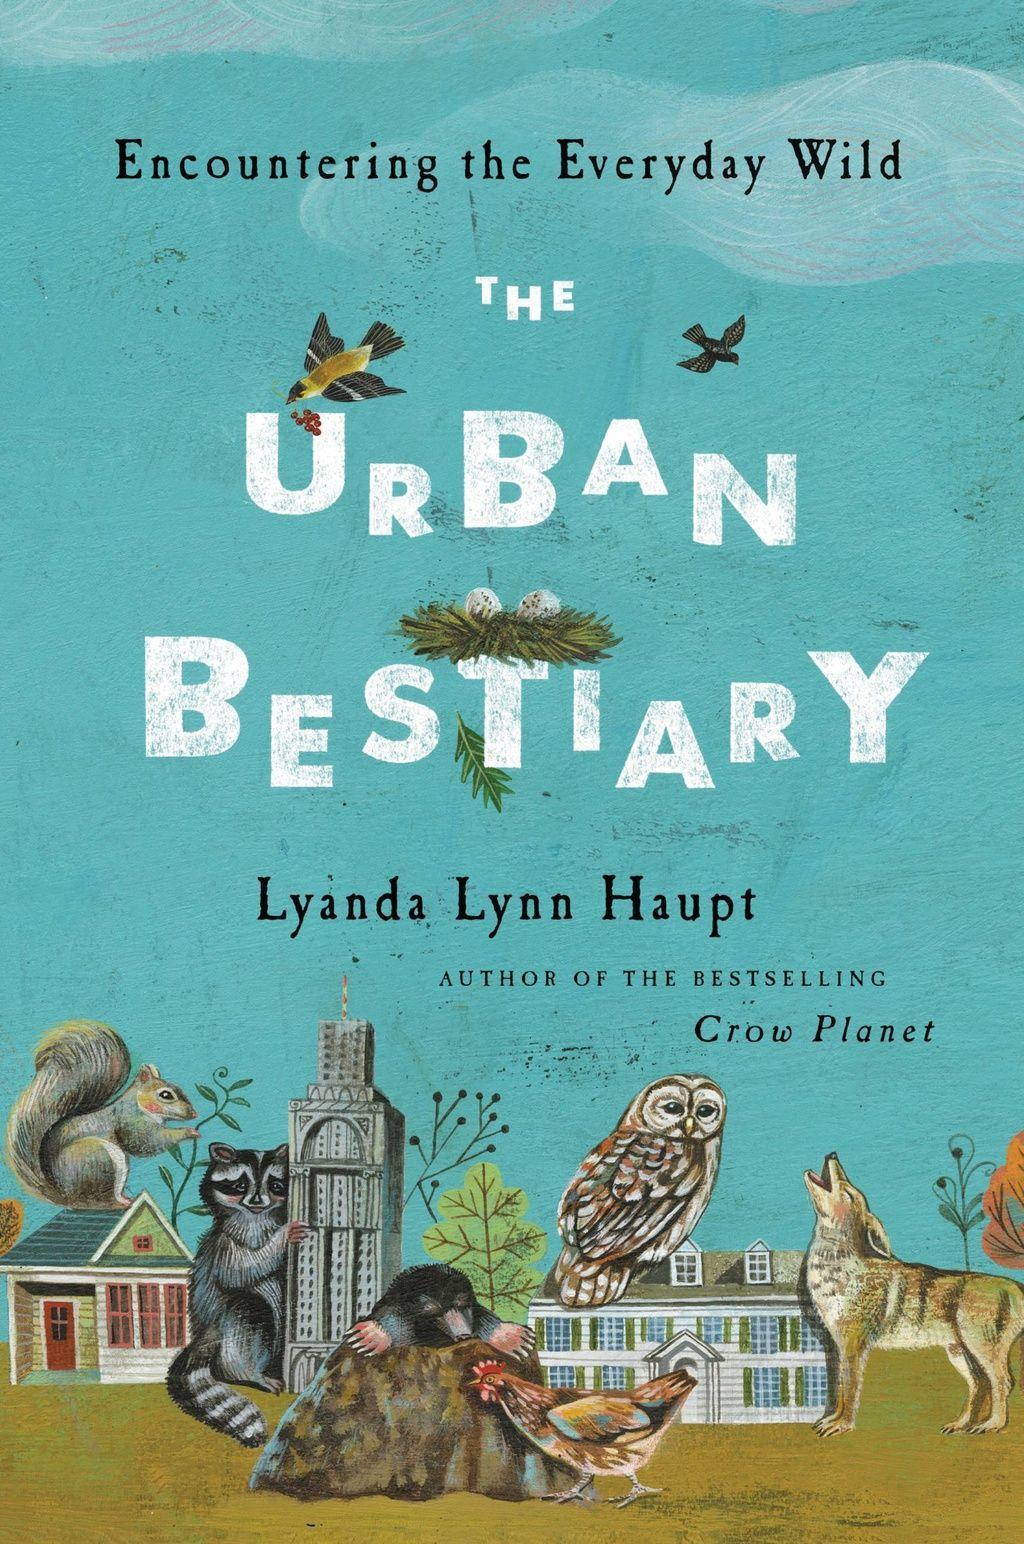 The Urban Bestiary: Encountering the Everyday Wild By Lyanda Lynn Haupt